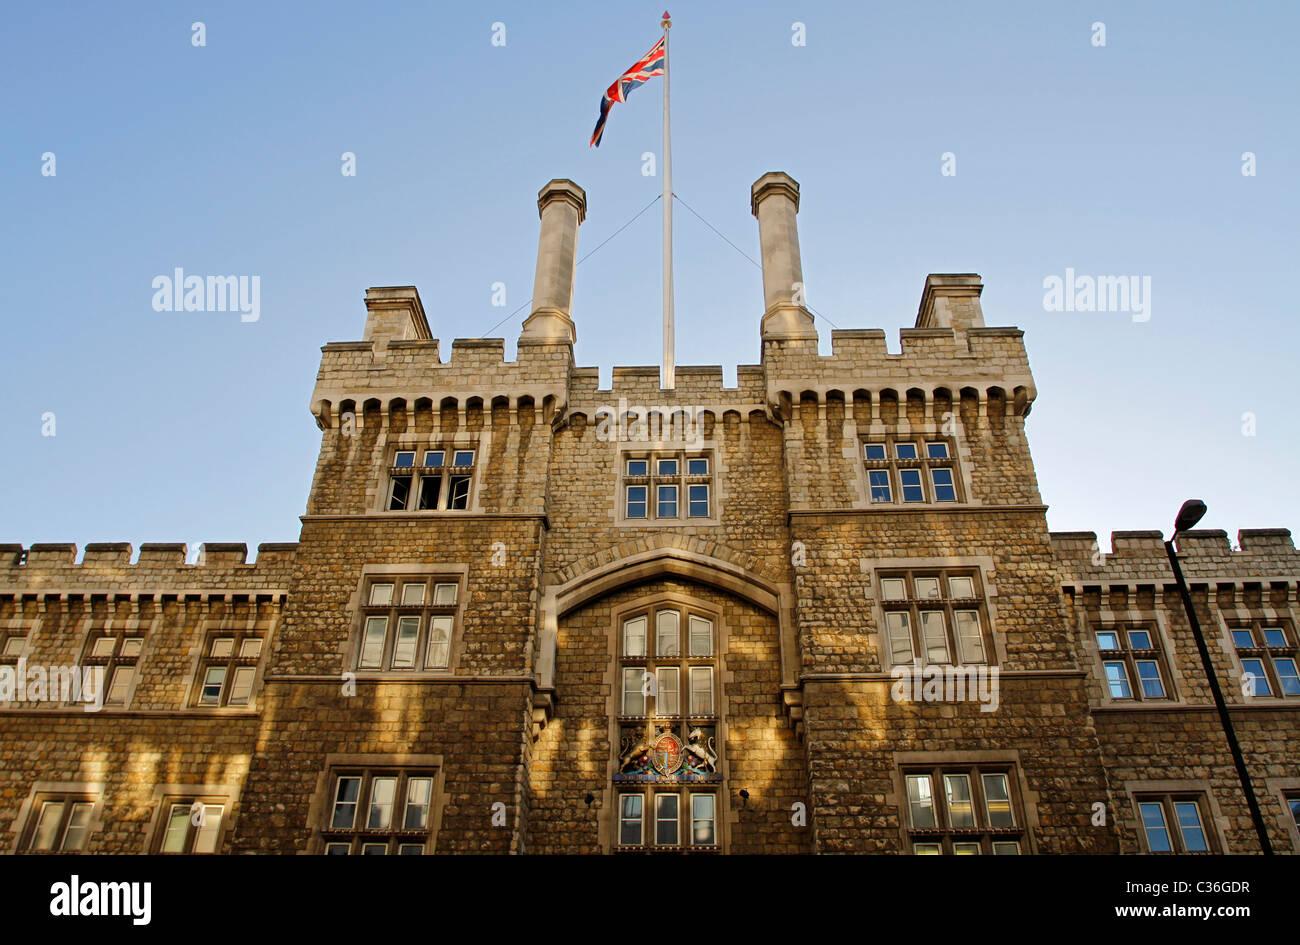 Casa de armería, Honorable Compañía de artillería, City Road, Londres, Inglaterra Imagen De Stock